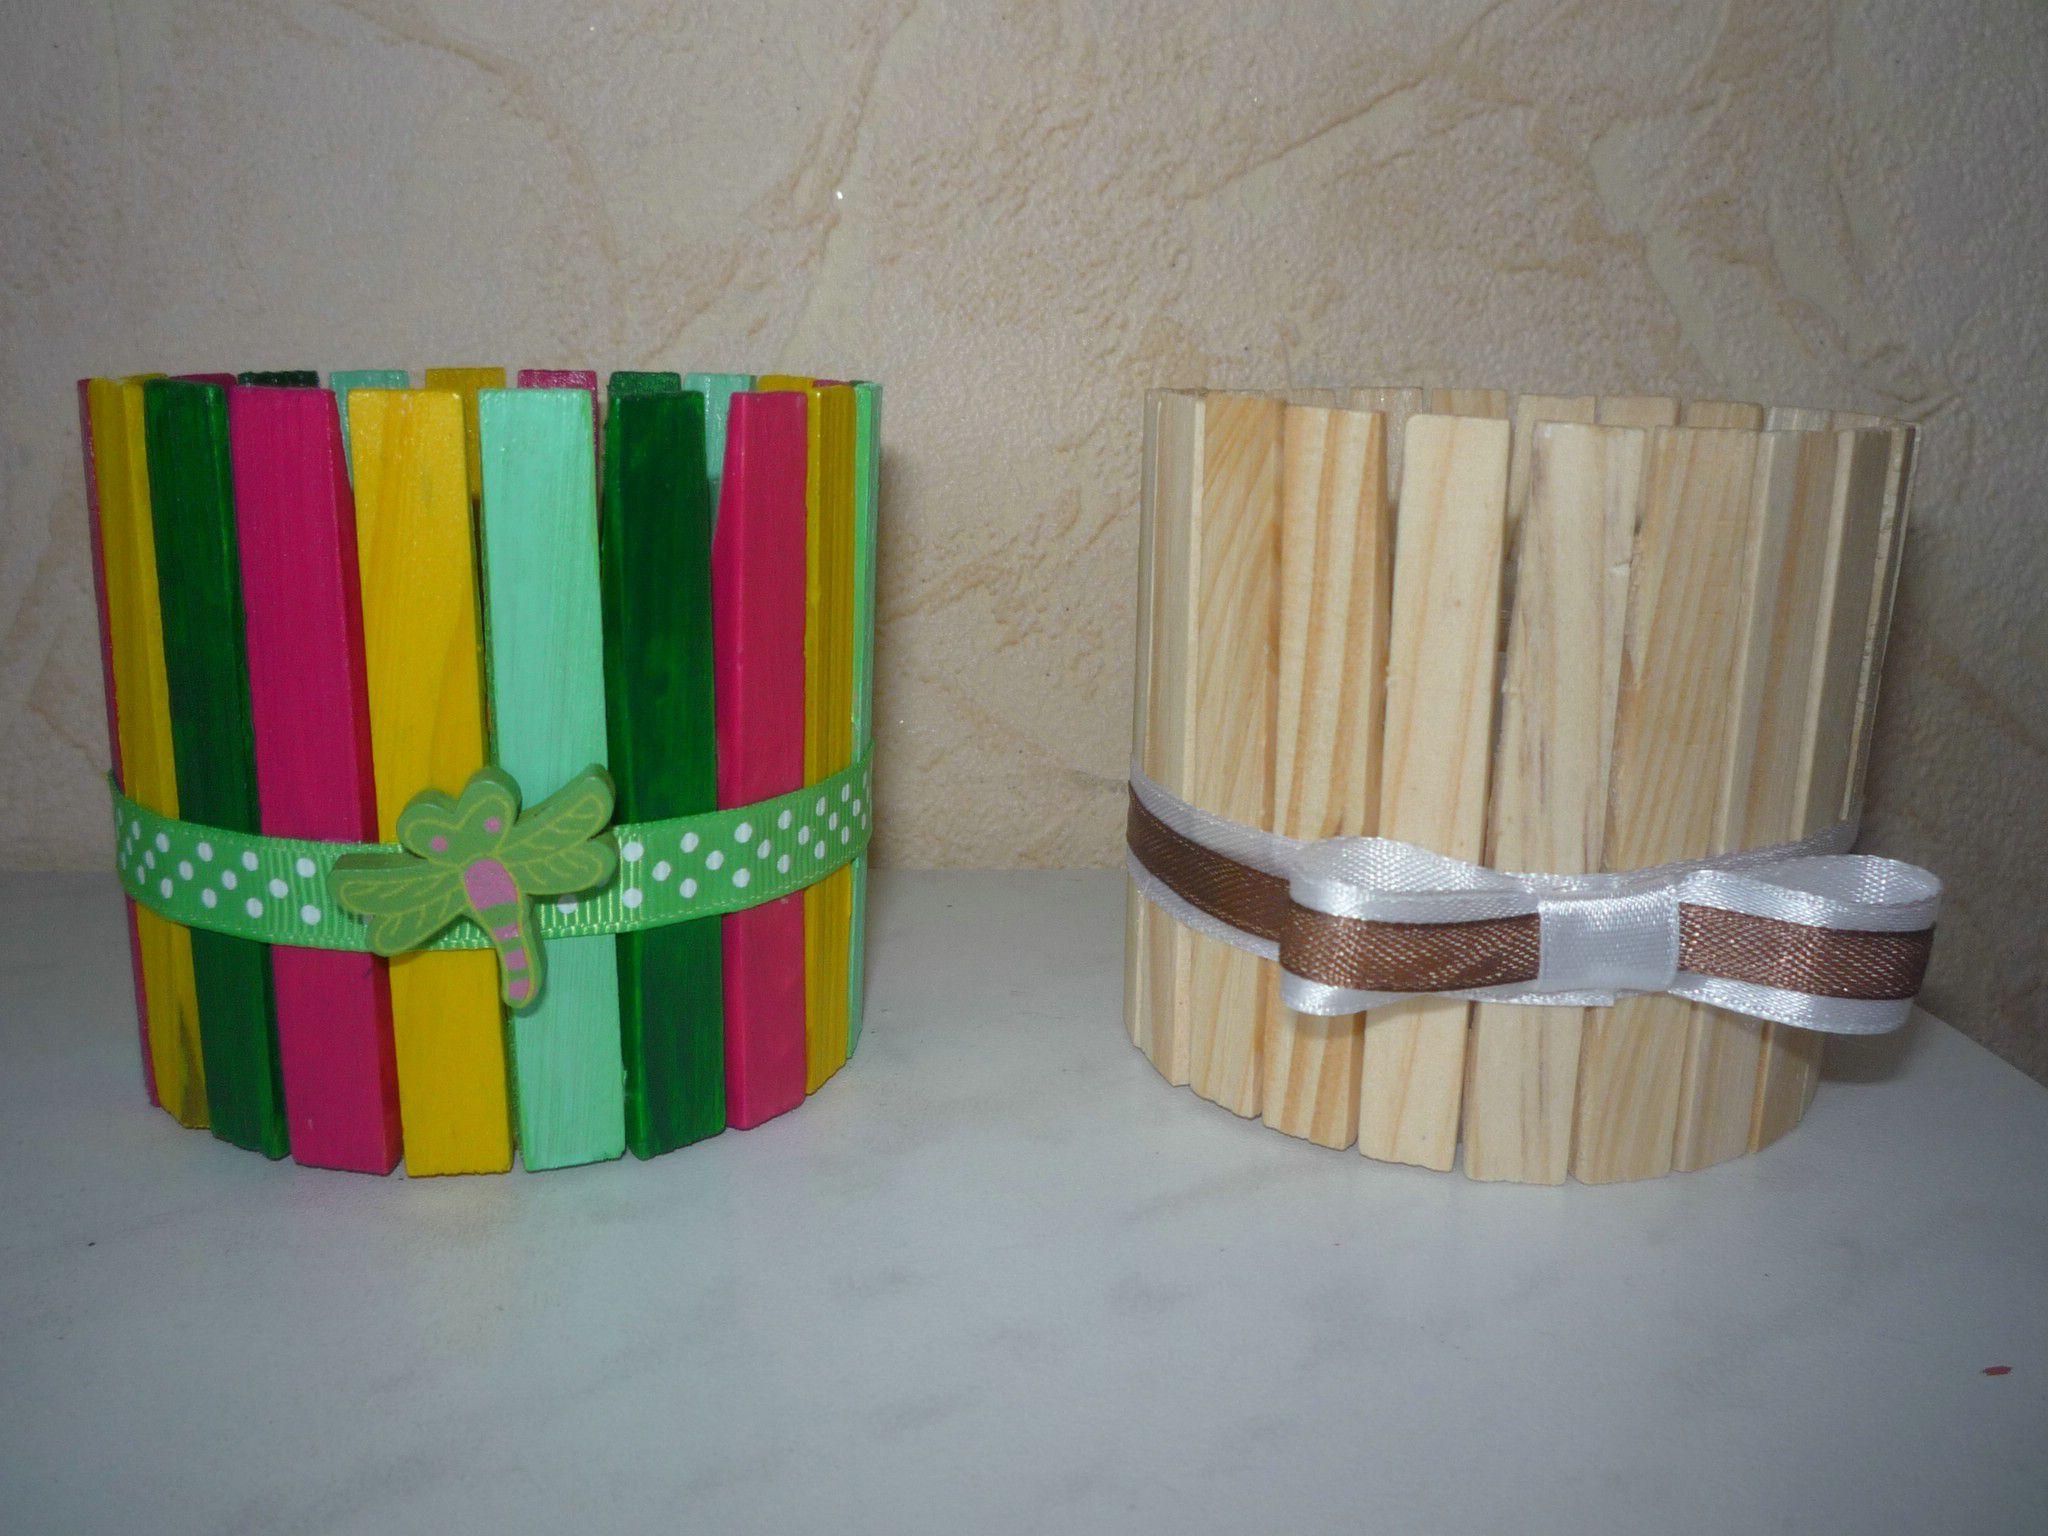 inspiration clothespinscandlehandmadediyhandicraftcreativeidea candleholderautumn